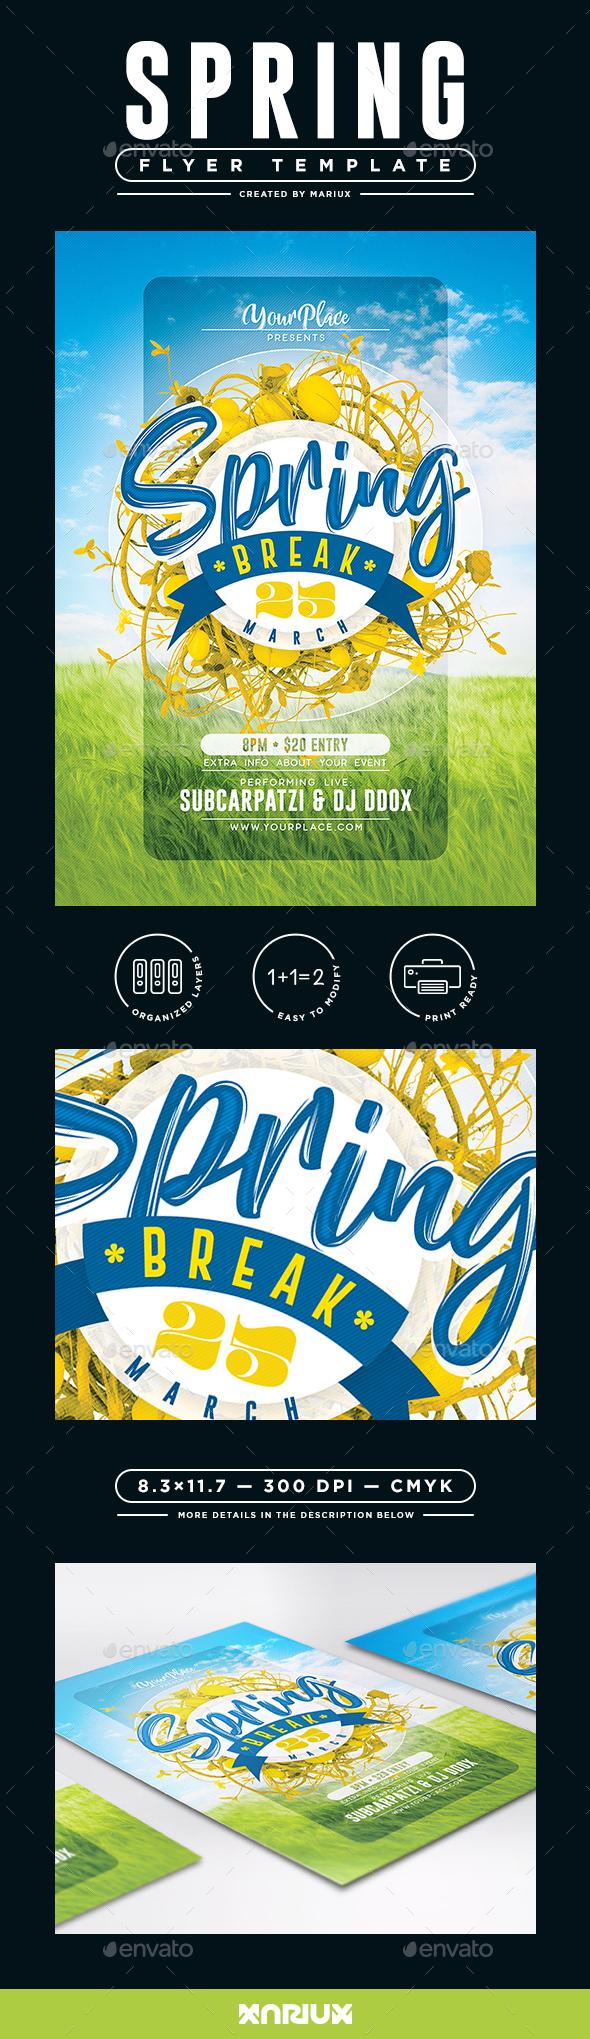 Spring Break Flyer/Poster - Events Flyers